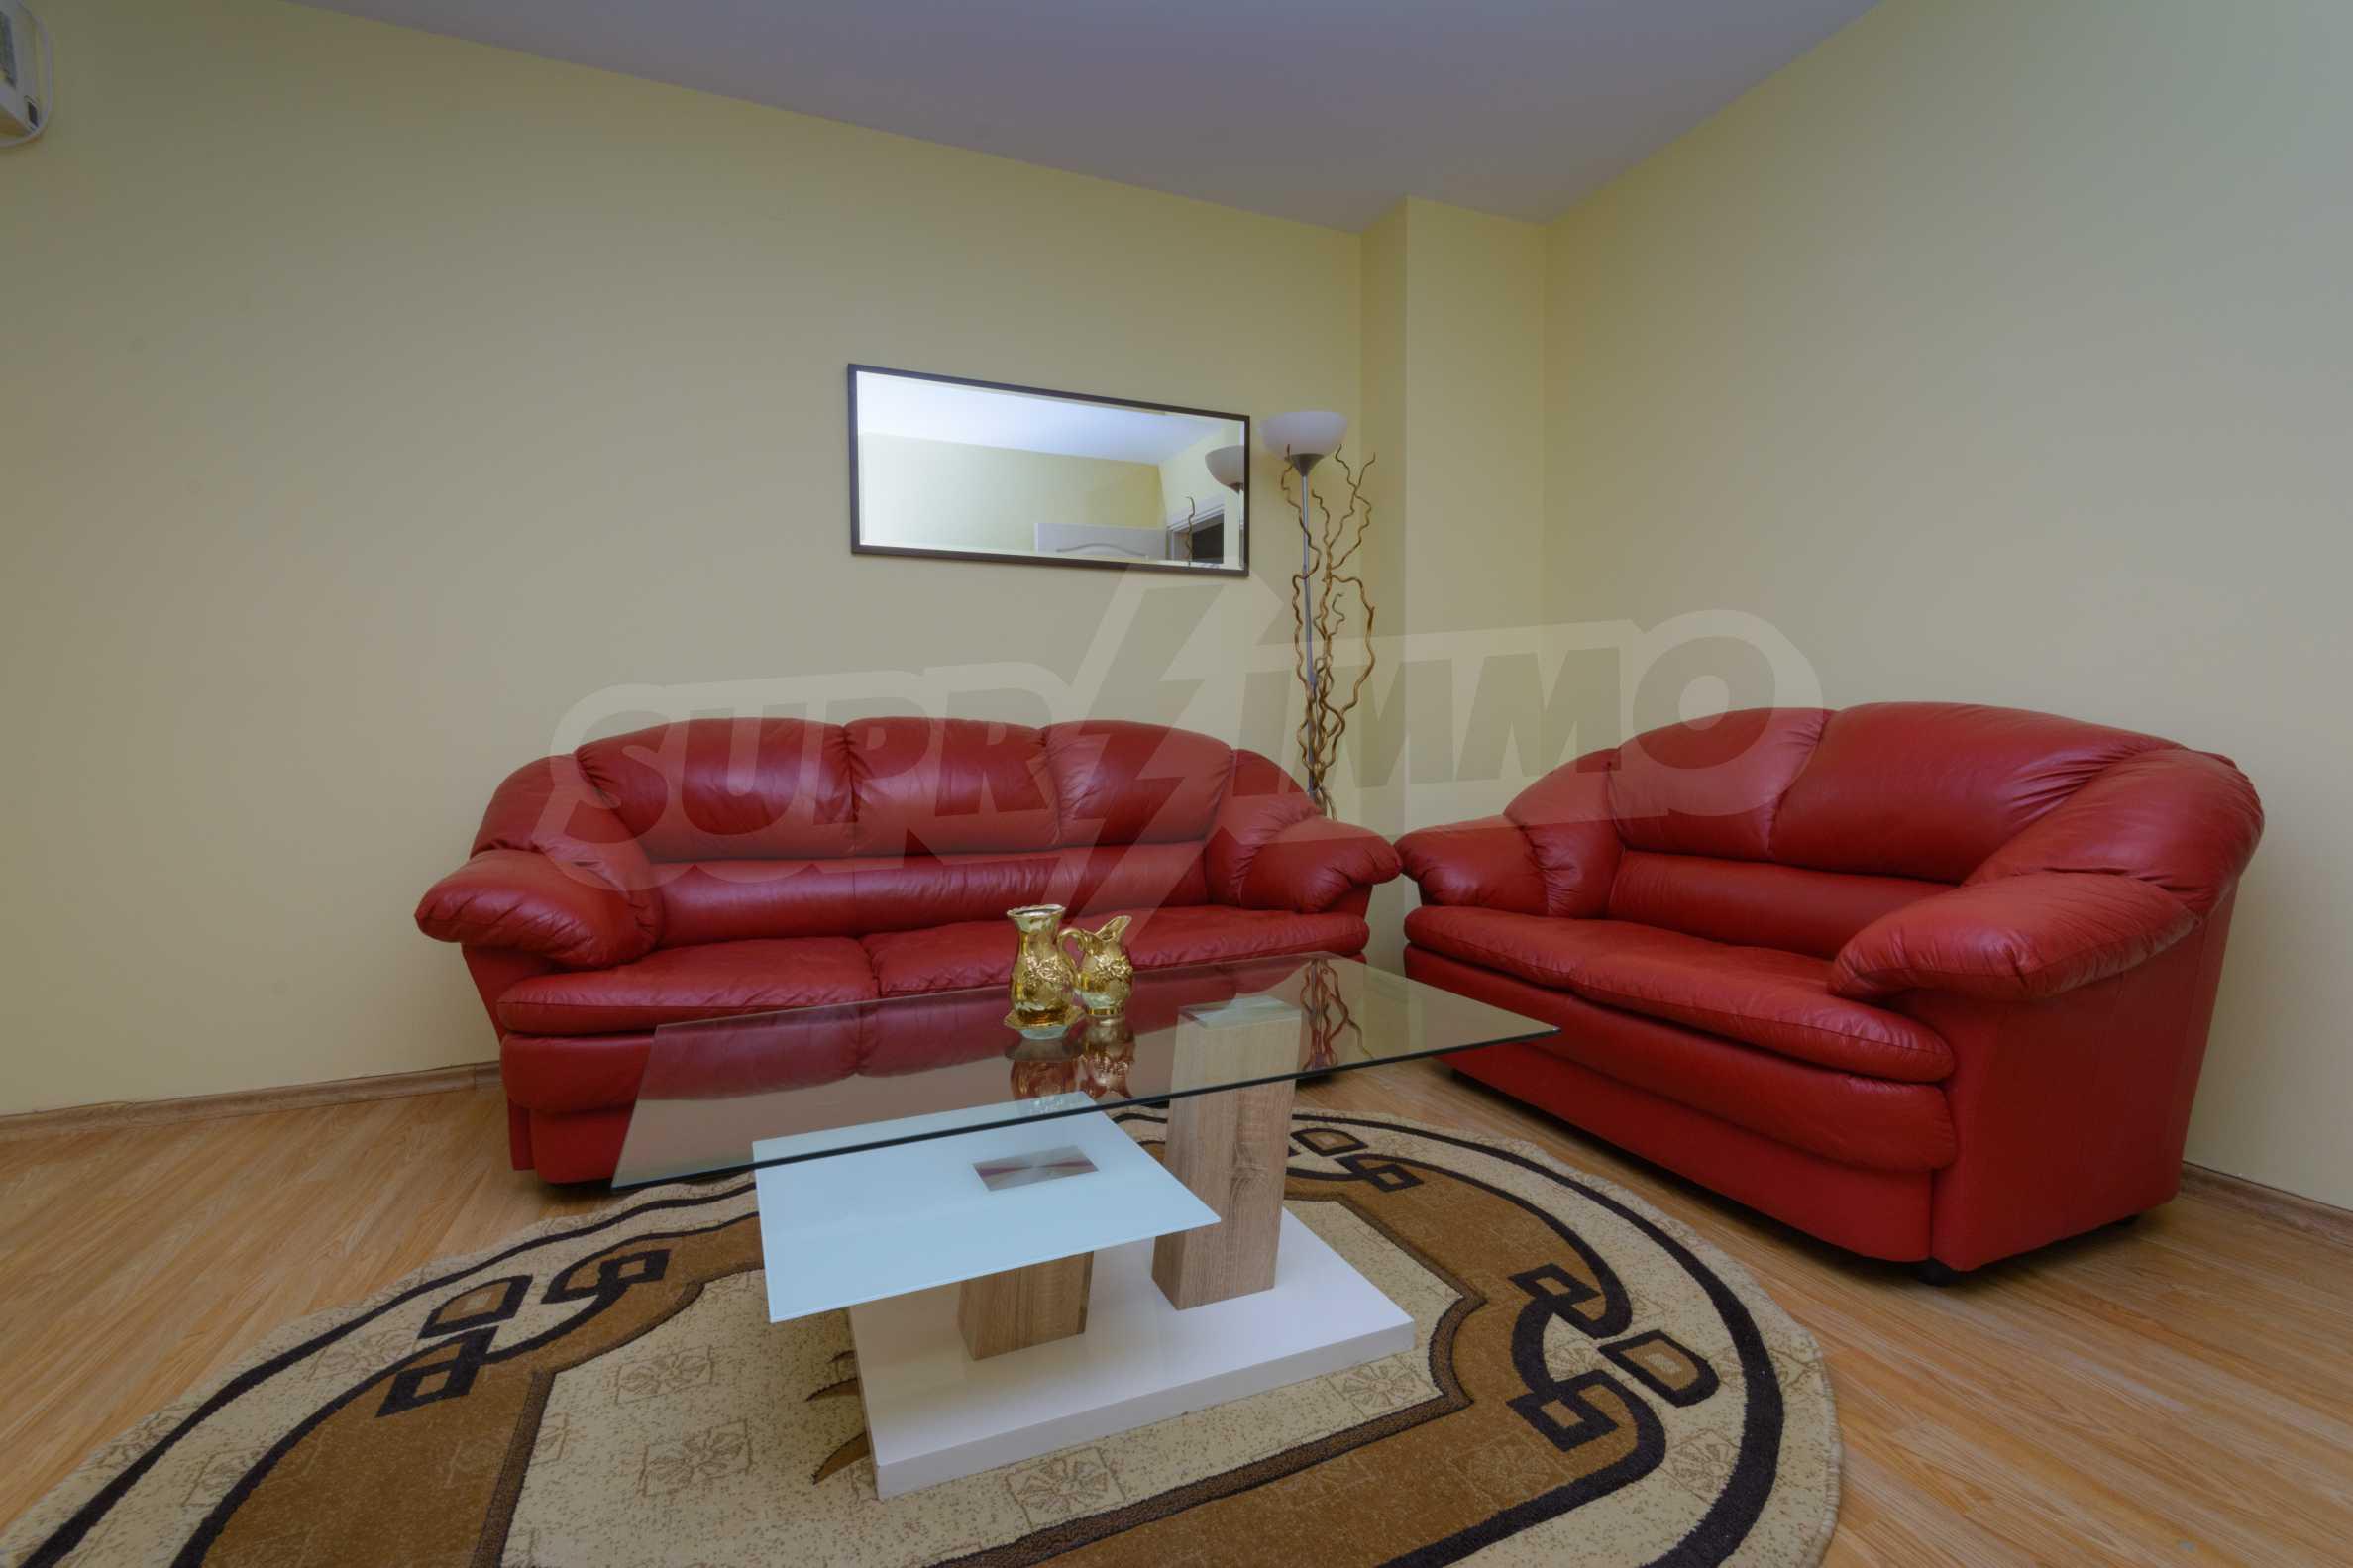 Многостаен апартамент до Гранд Хотел Пловдив 5